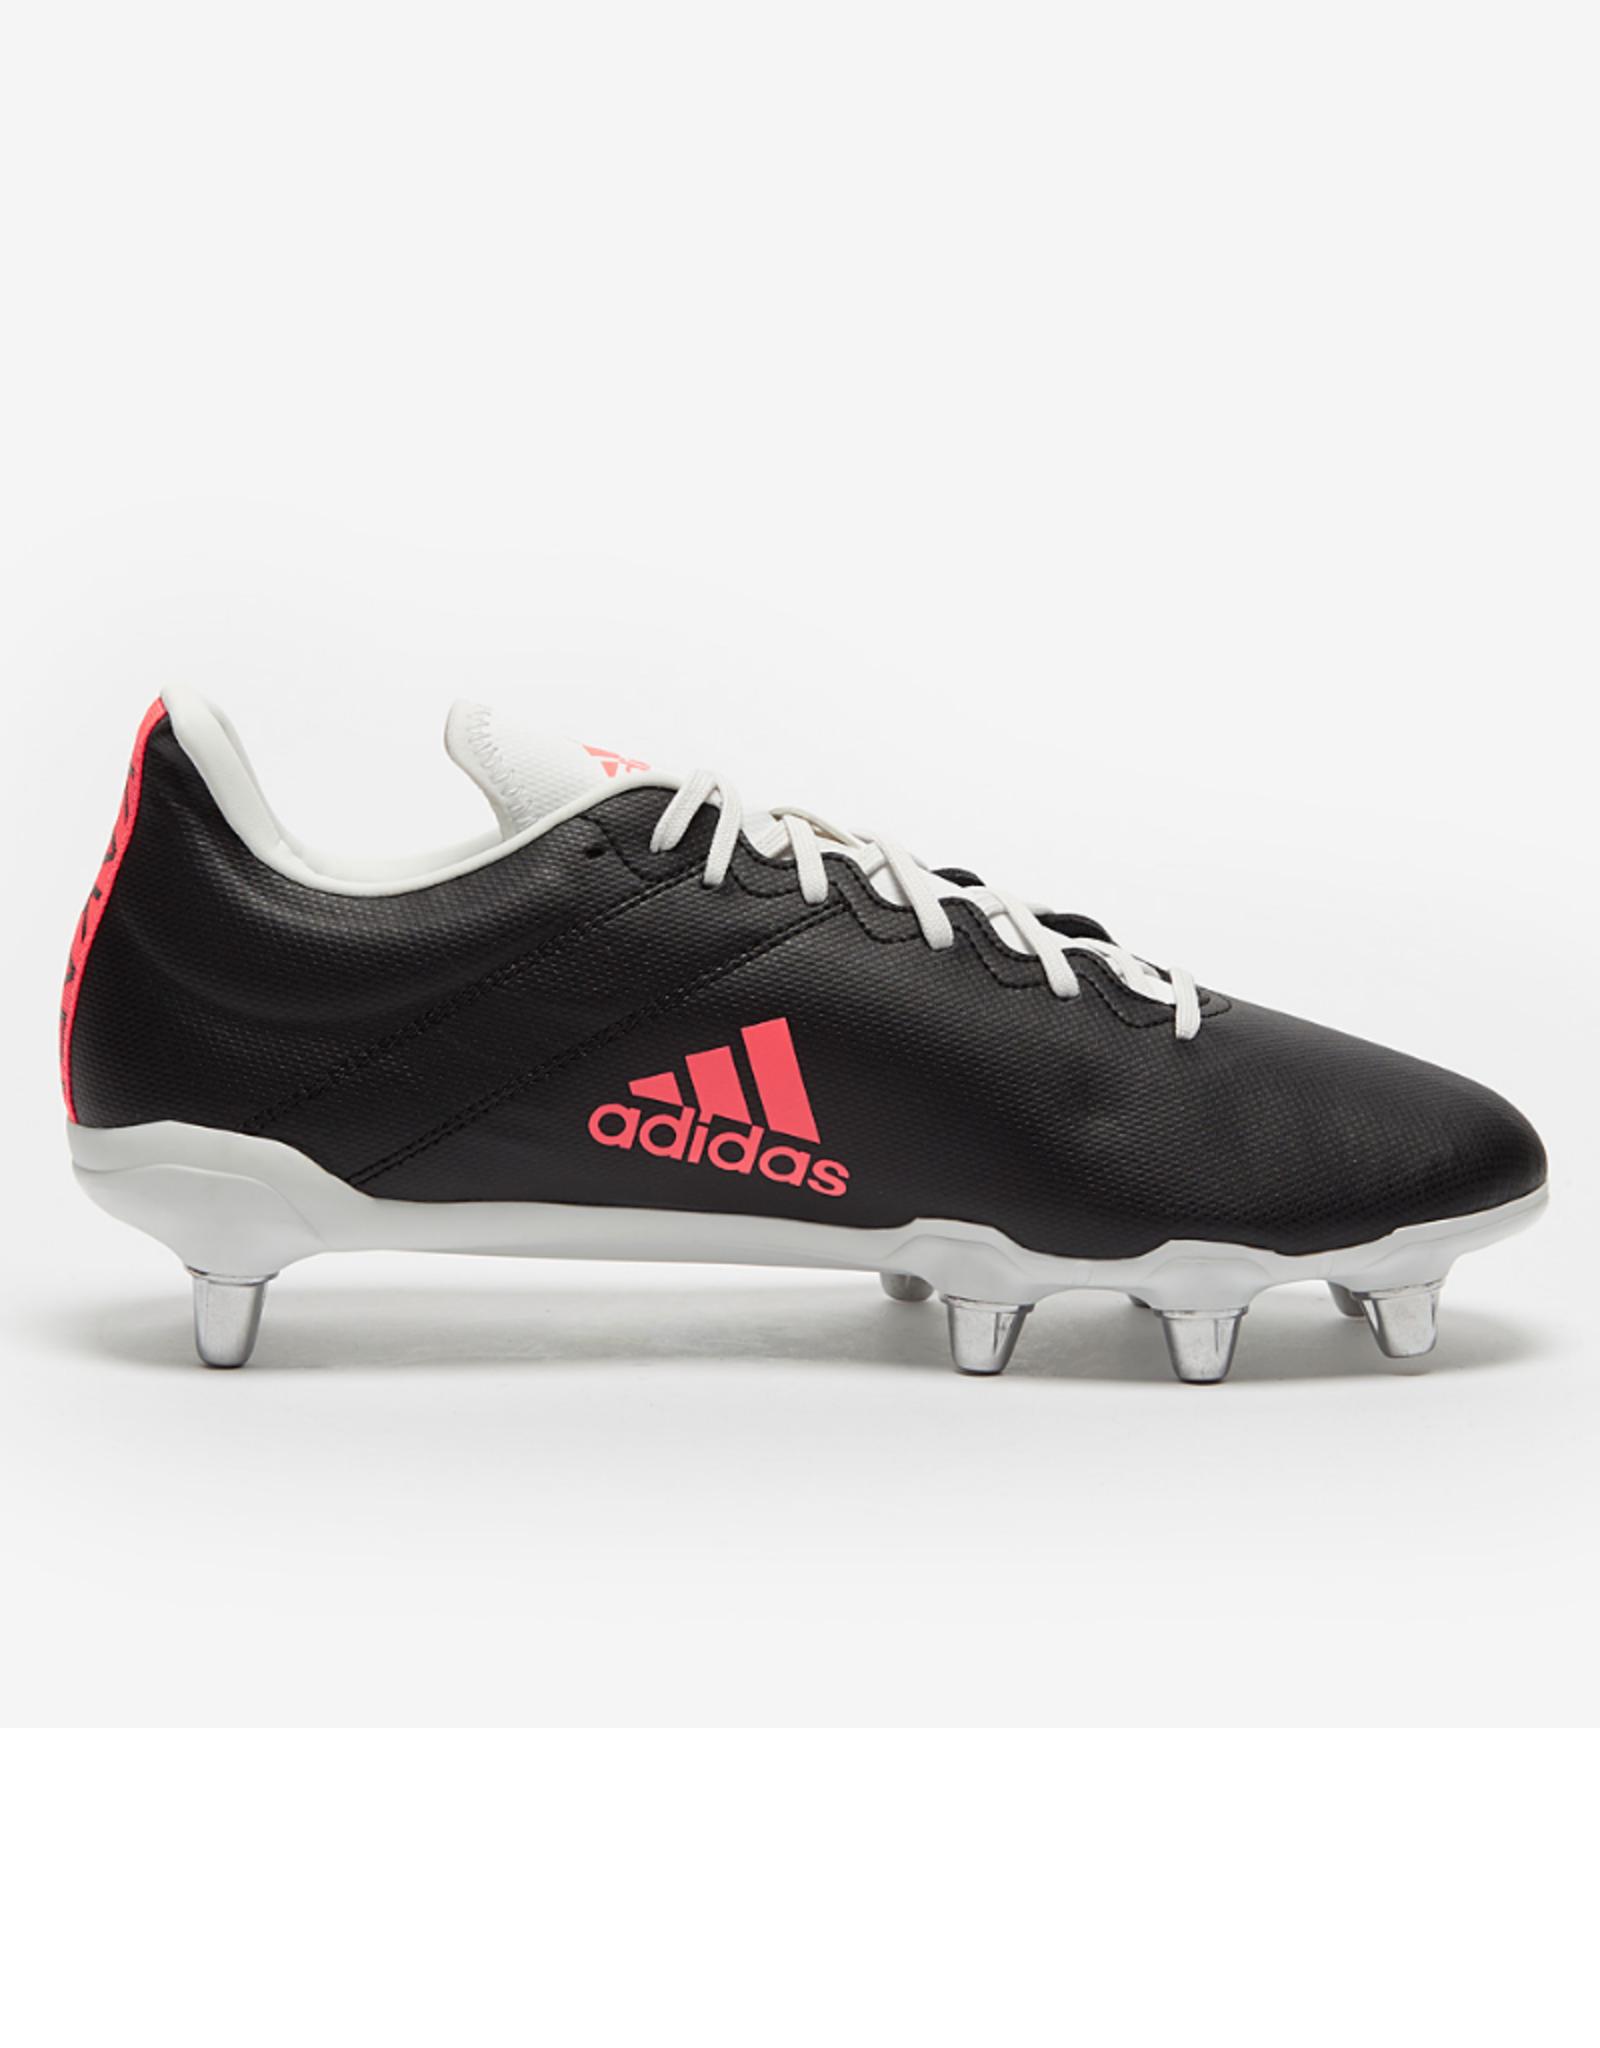 Adidas Adidas Kakari Rugby Cleat Black/Pink